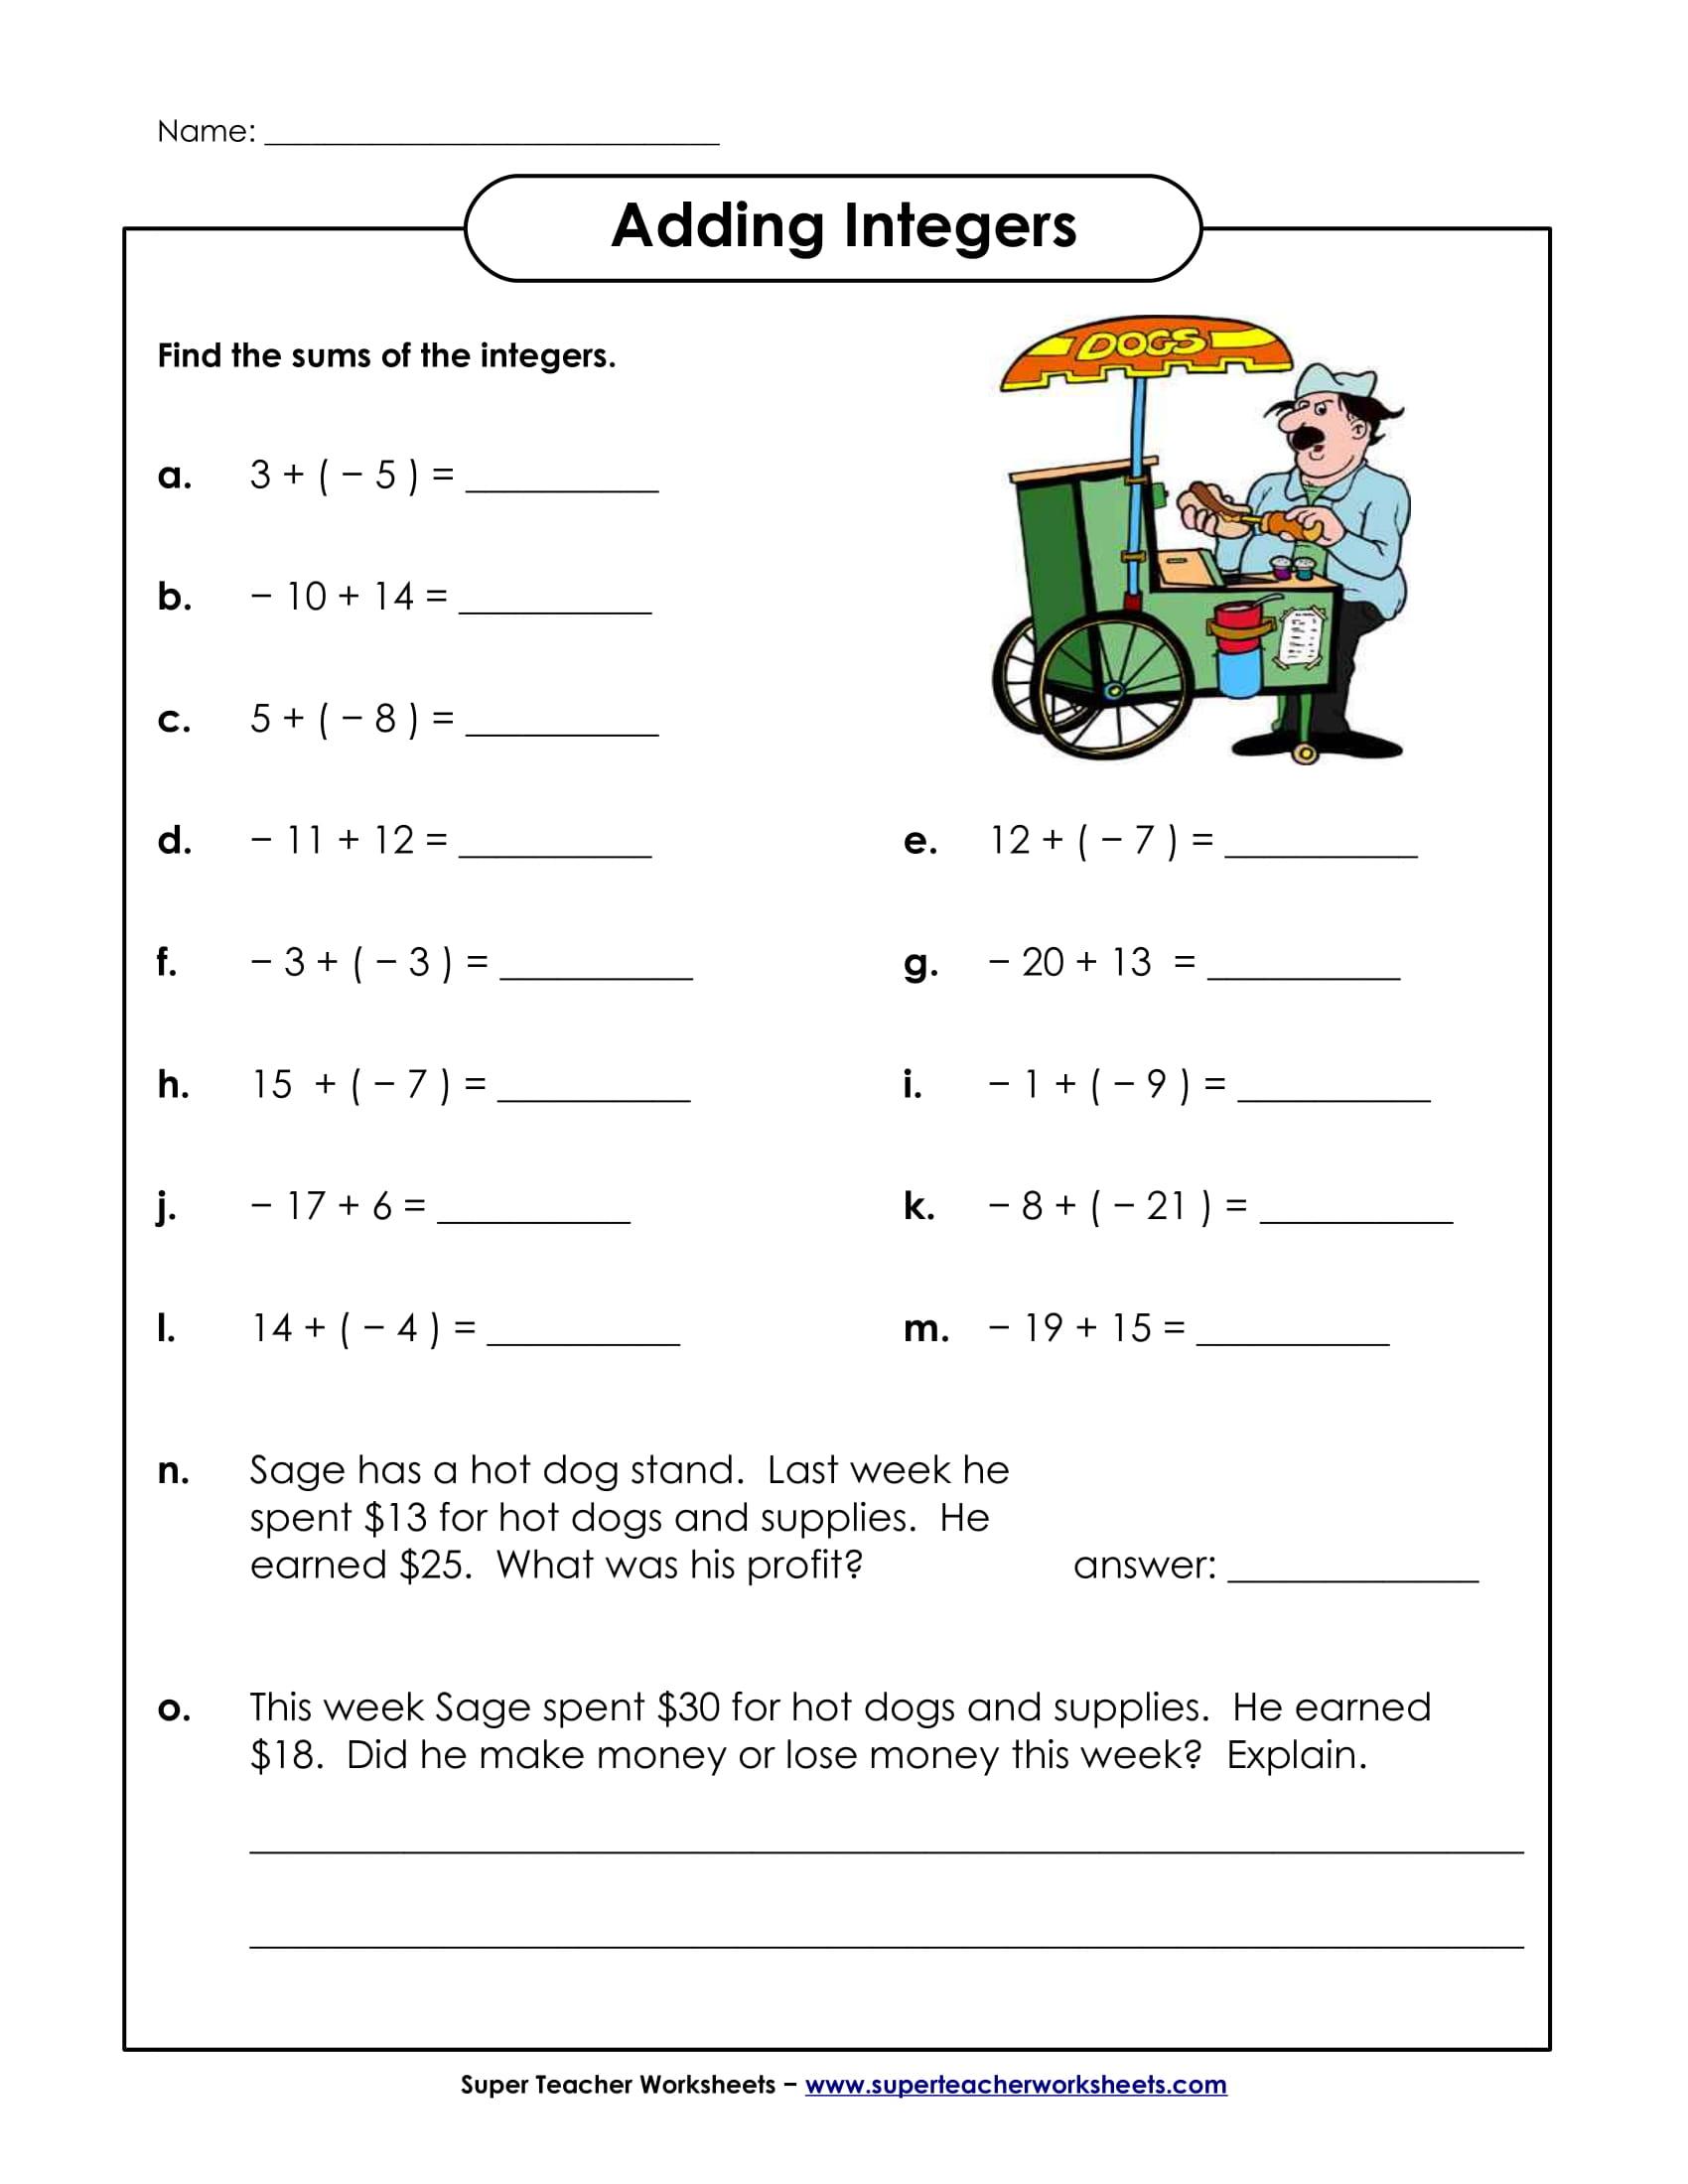 Adding Integers Sample Worksheet